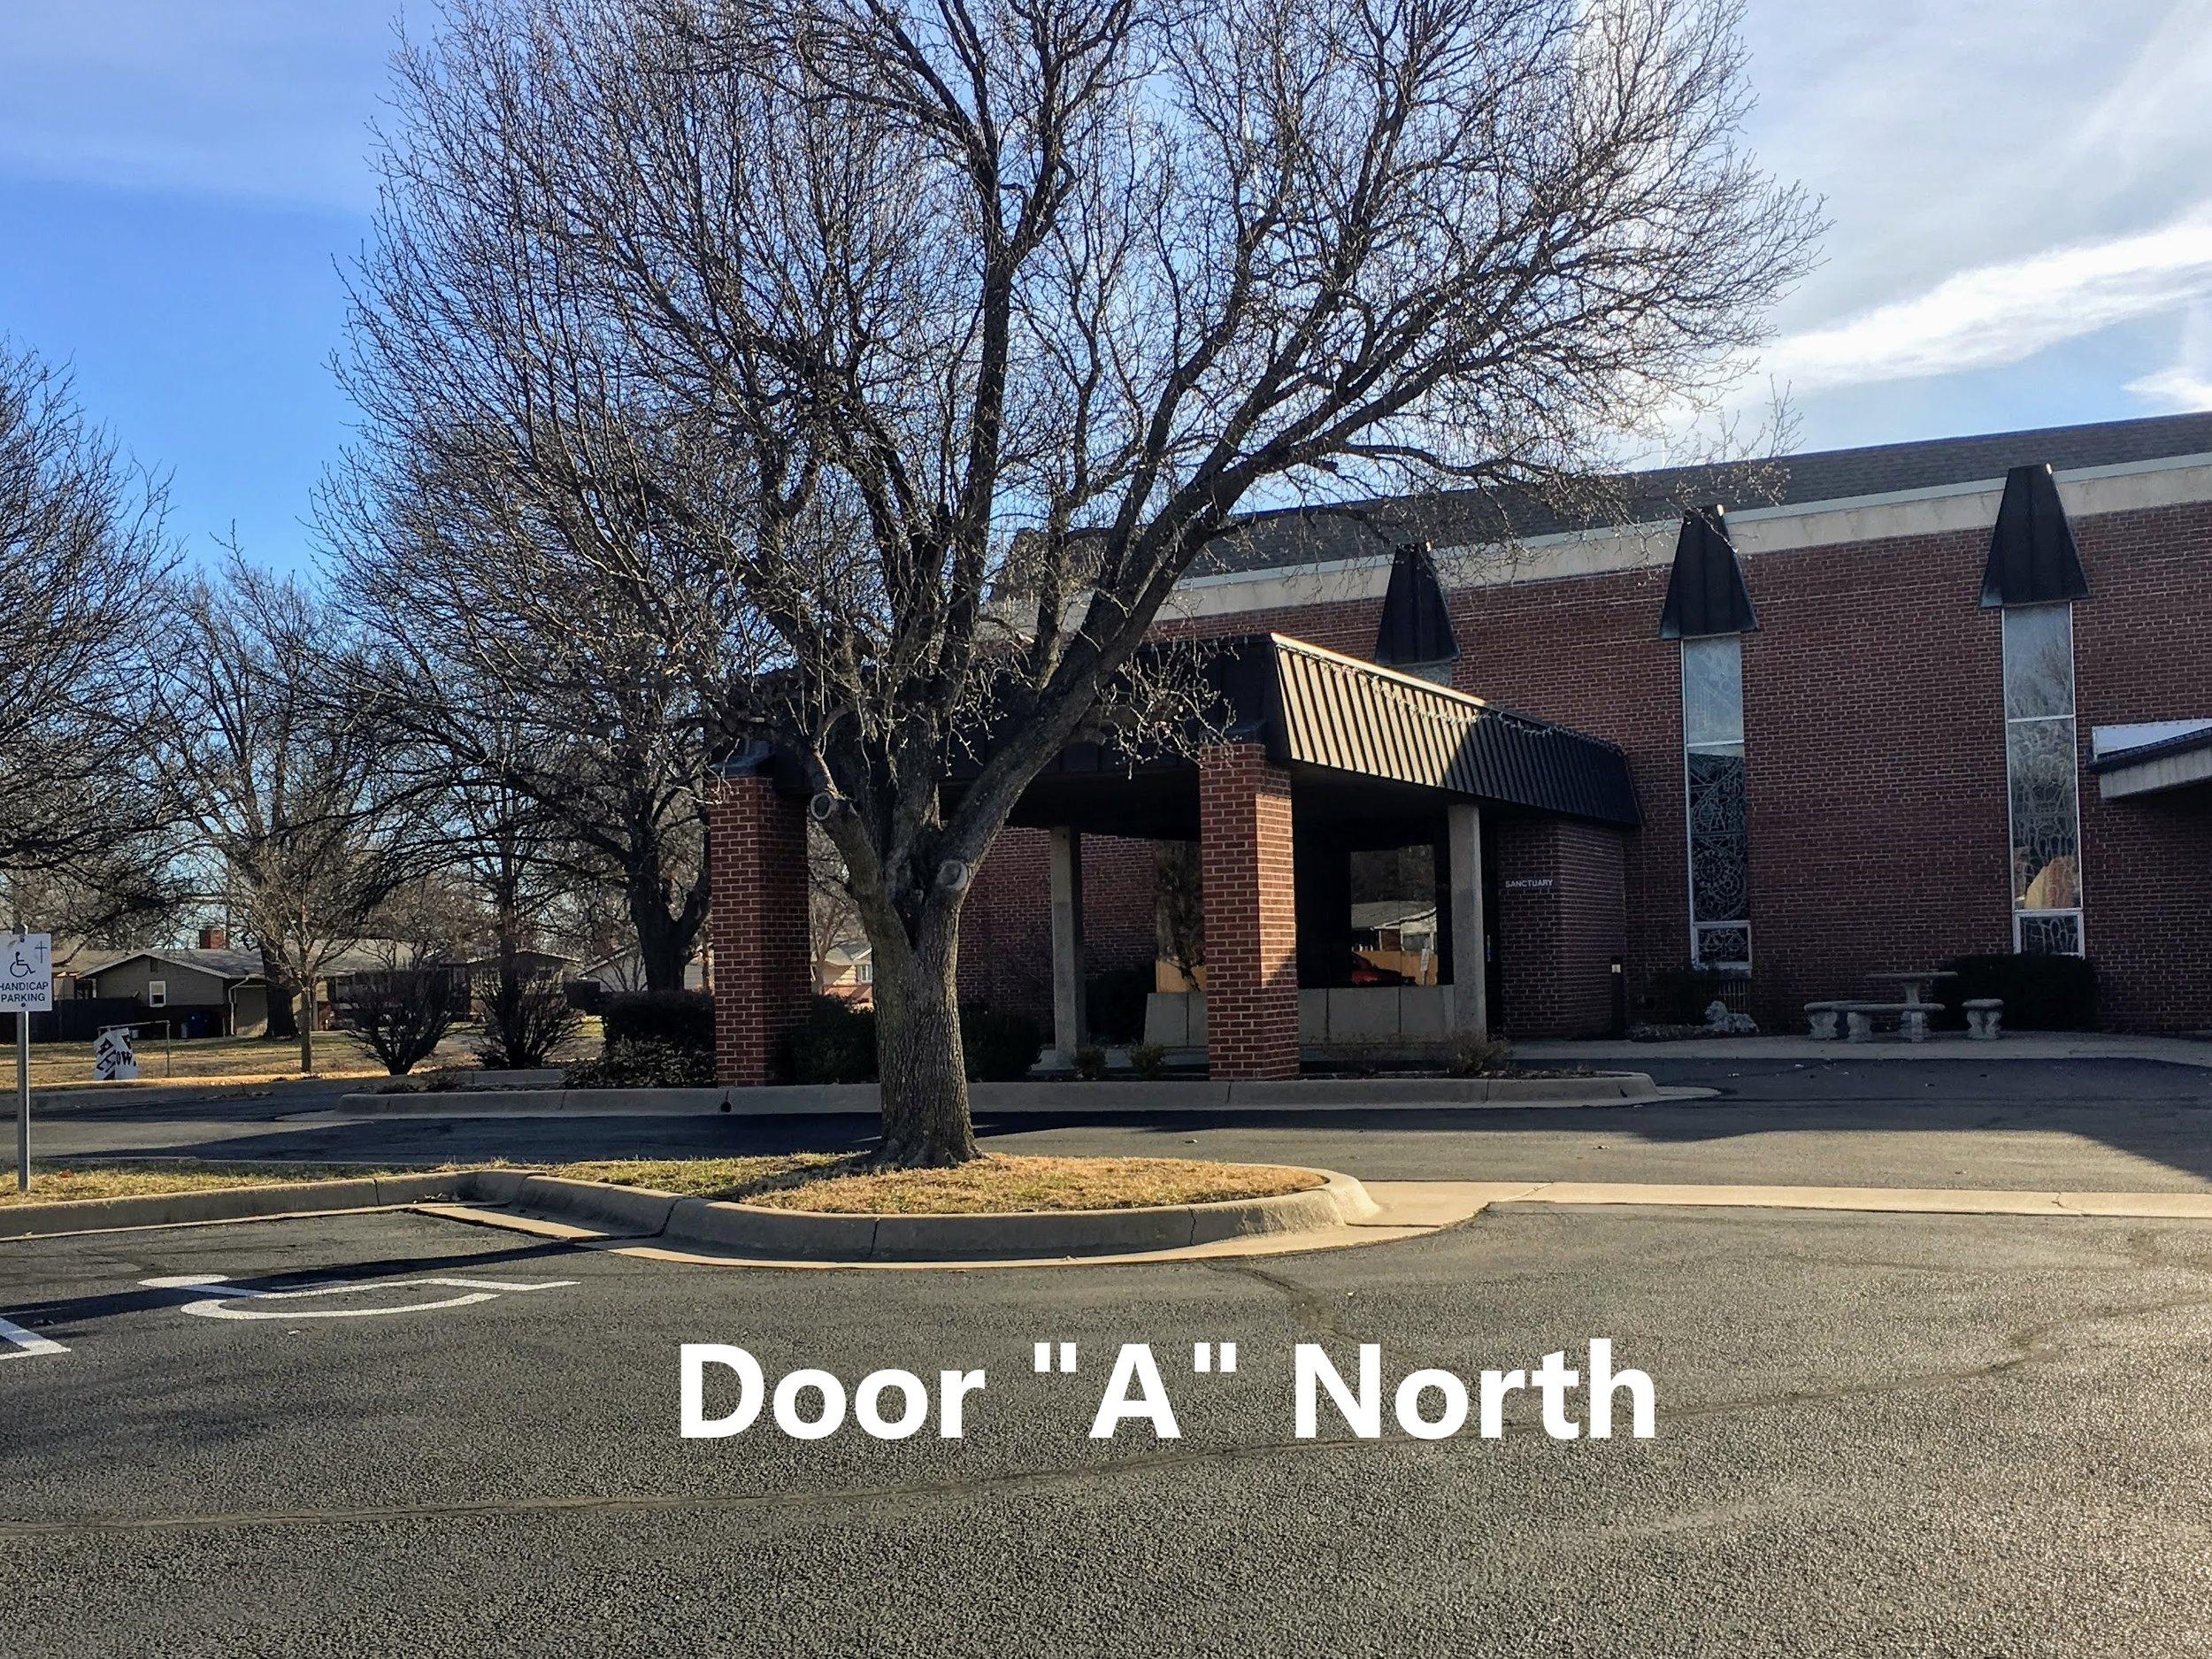 Door A North.jpg